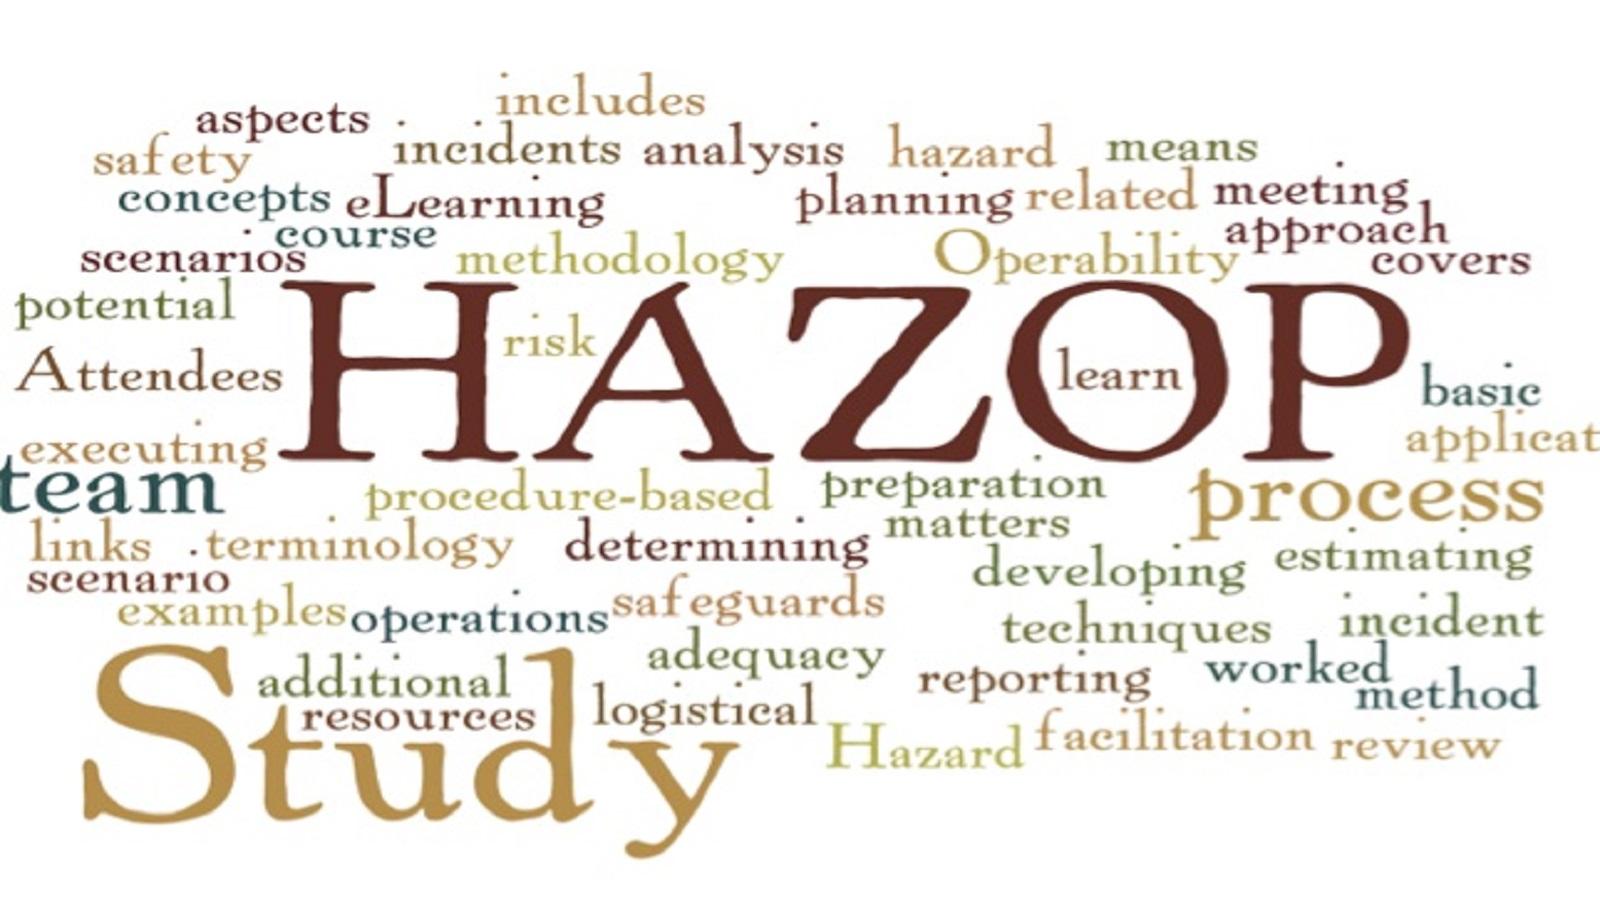 SmartBrains-HAZOPS-Engineers-Training-Certification-Intrenship-oil & Gas-Industry-Noida-Pune-SUdan-Dubai-Chennai